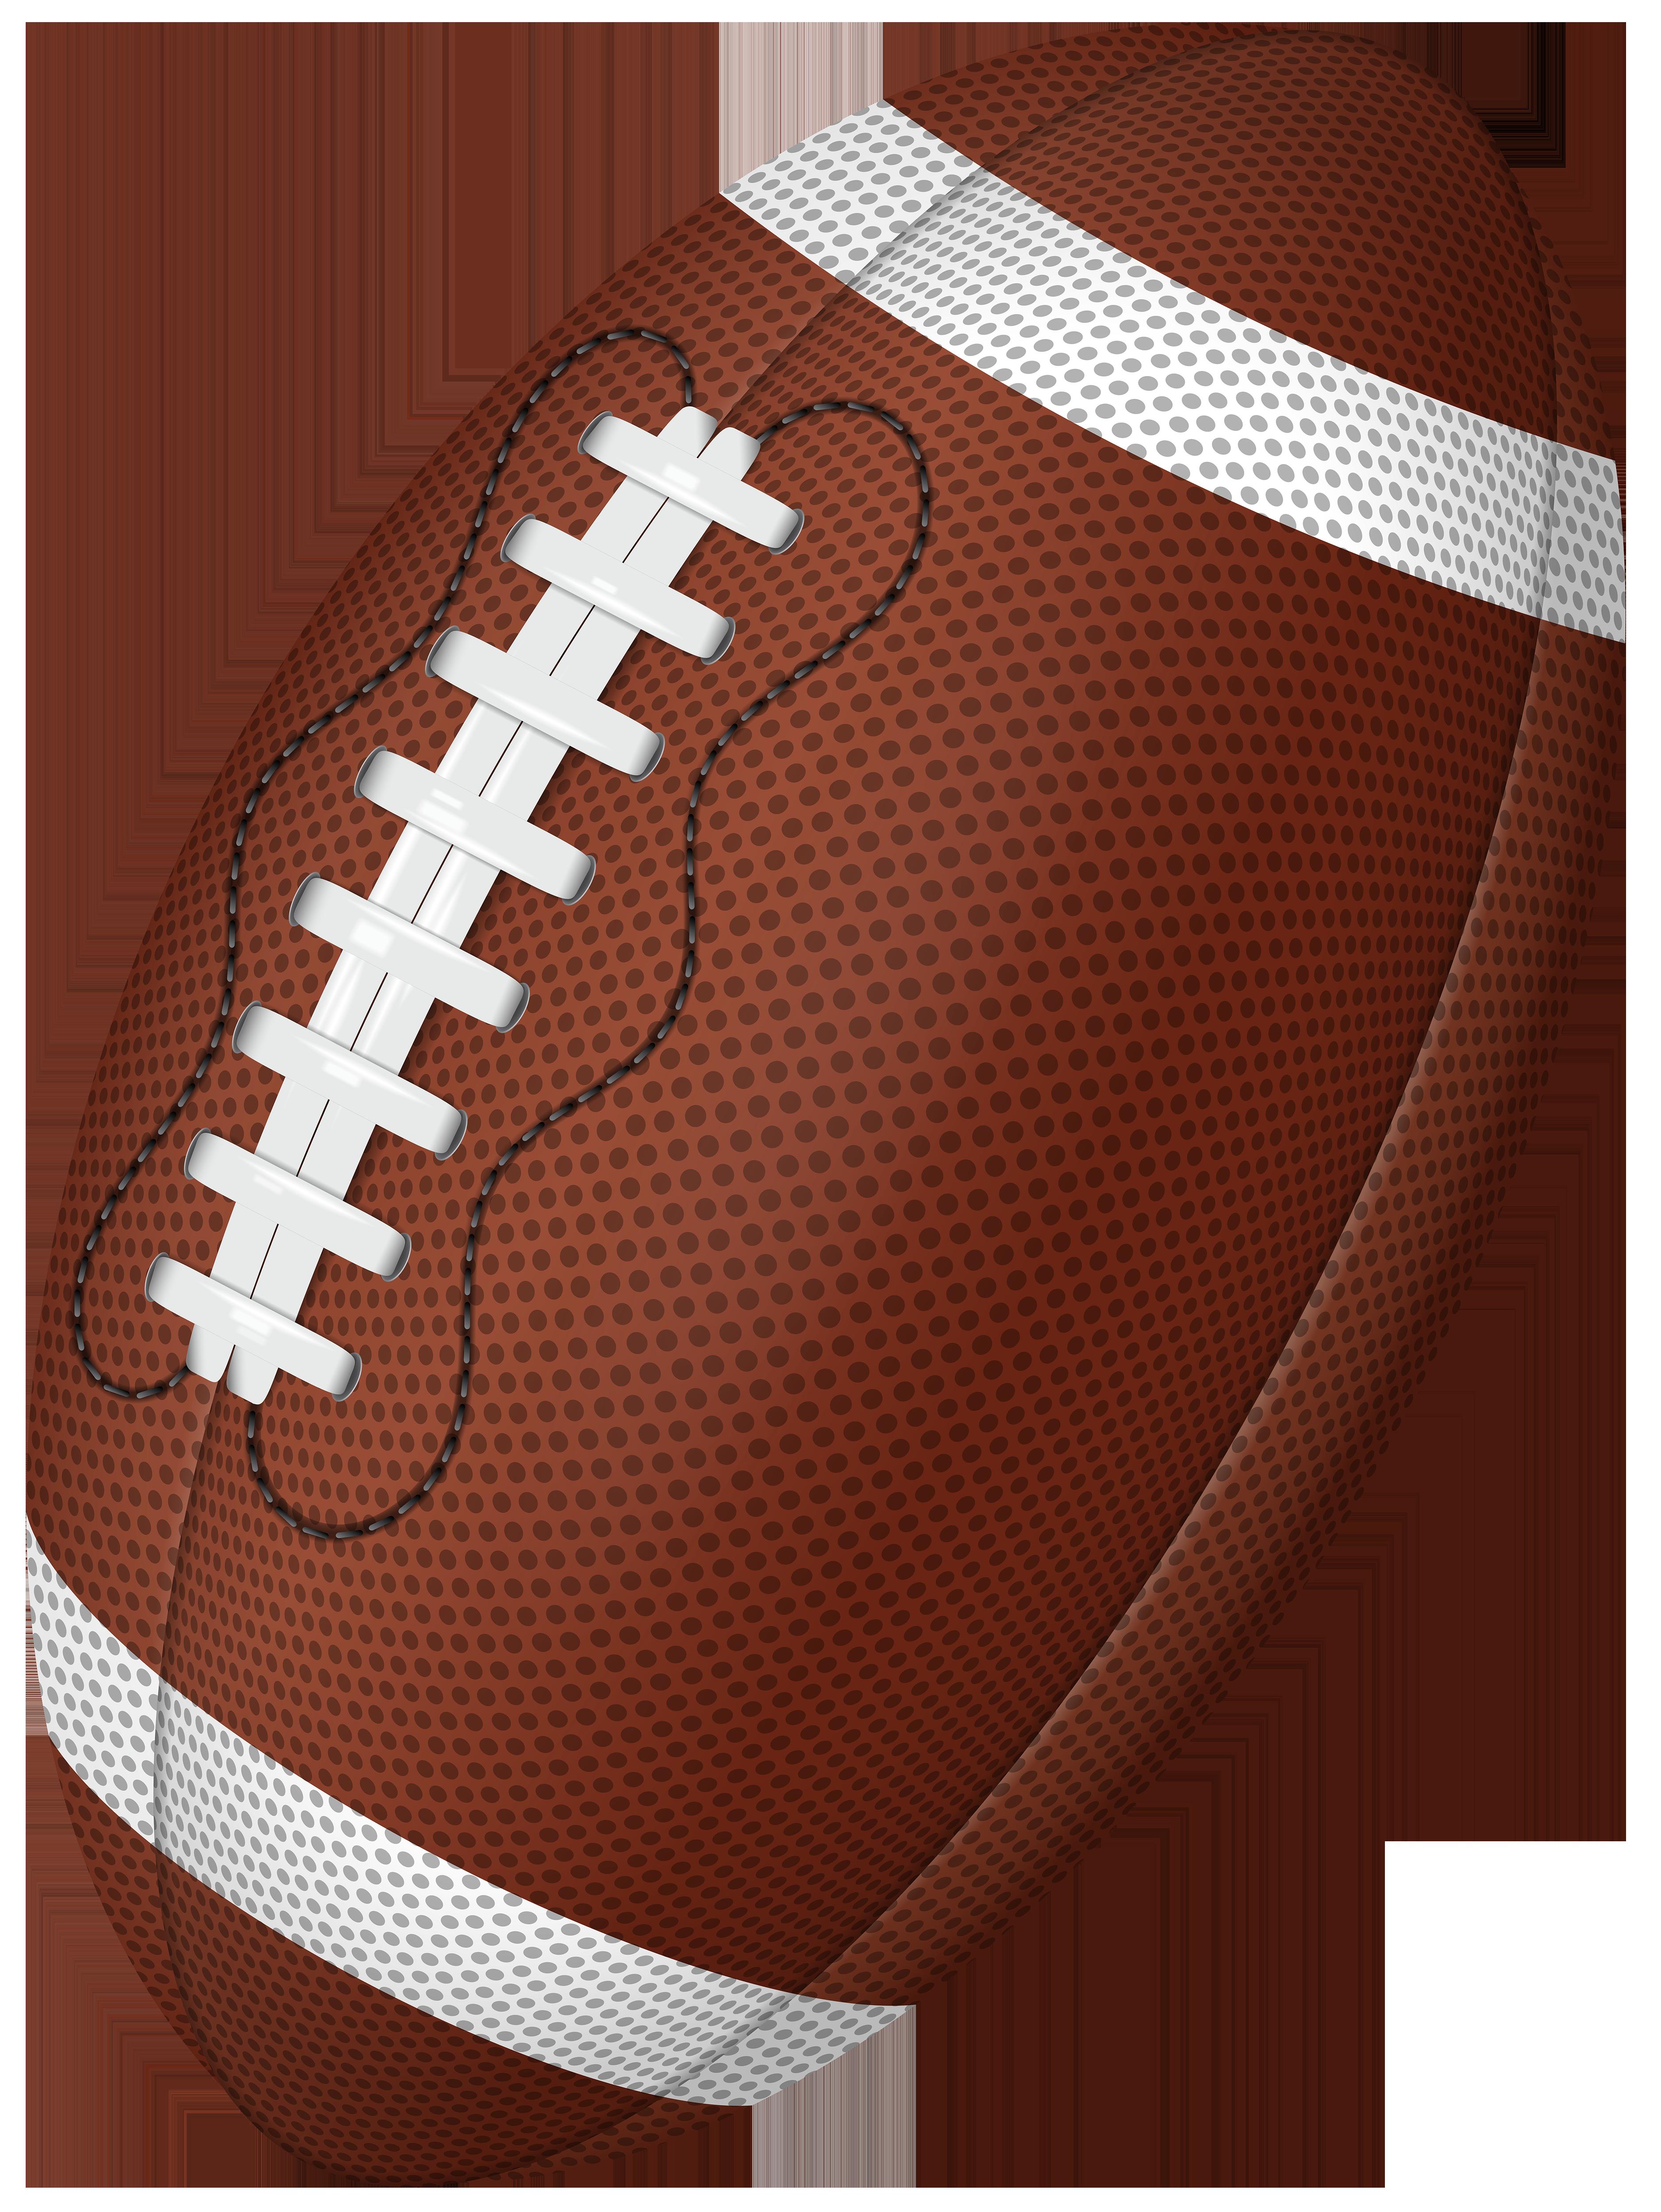 American Football Ball Png American Americanfootballdrawing Ball Football Png In 2020 American Football Football Ball Football